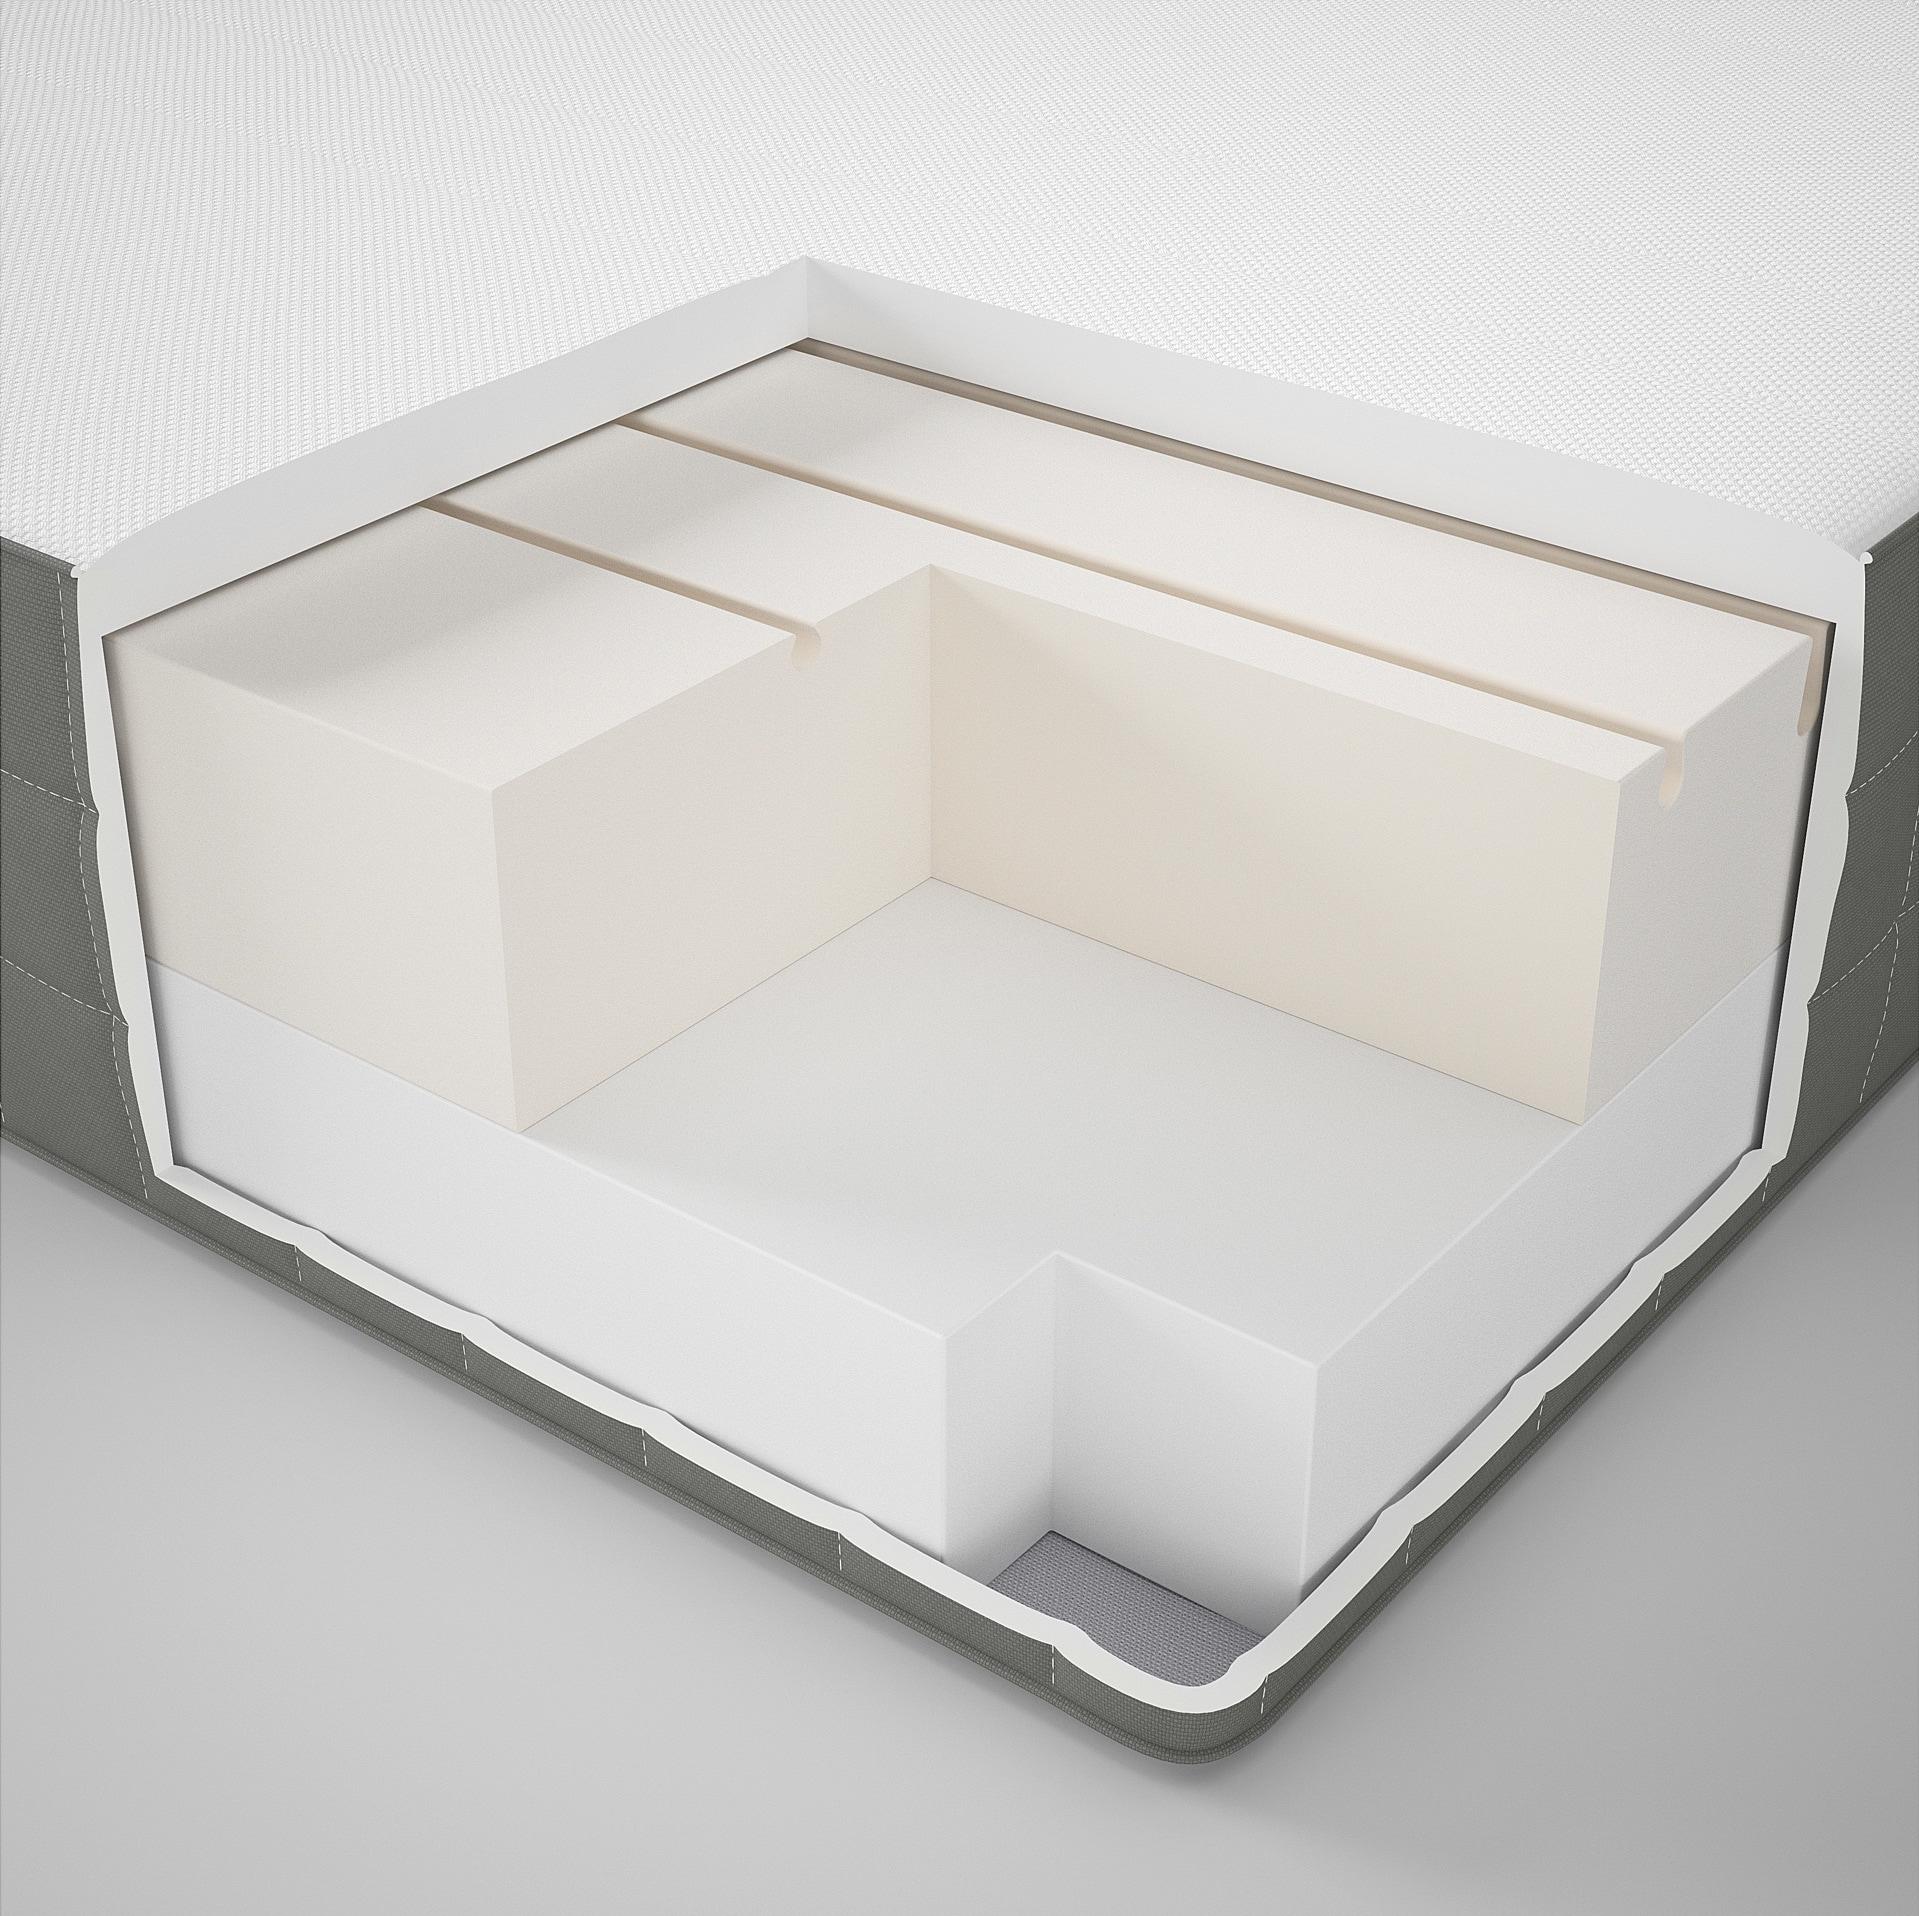 IKEA Morgedal Latexmatratze Aufbau